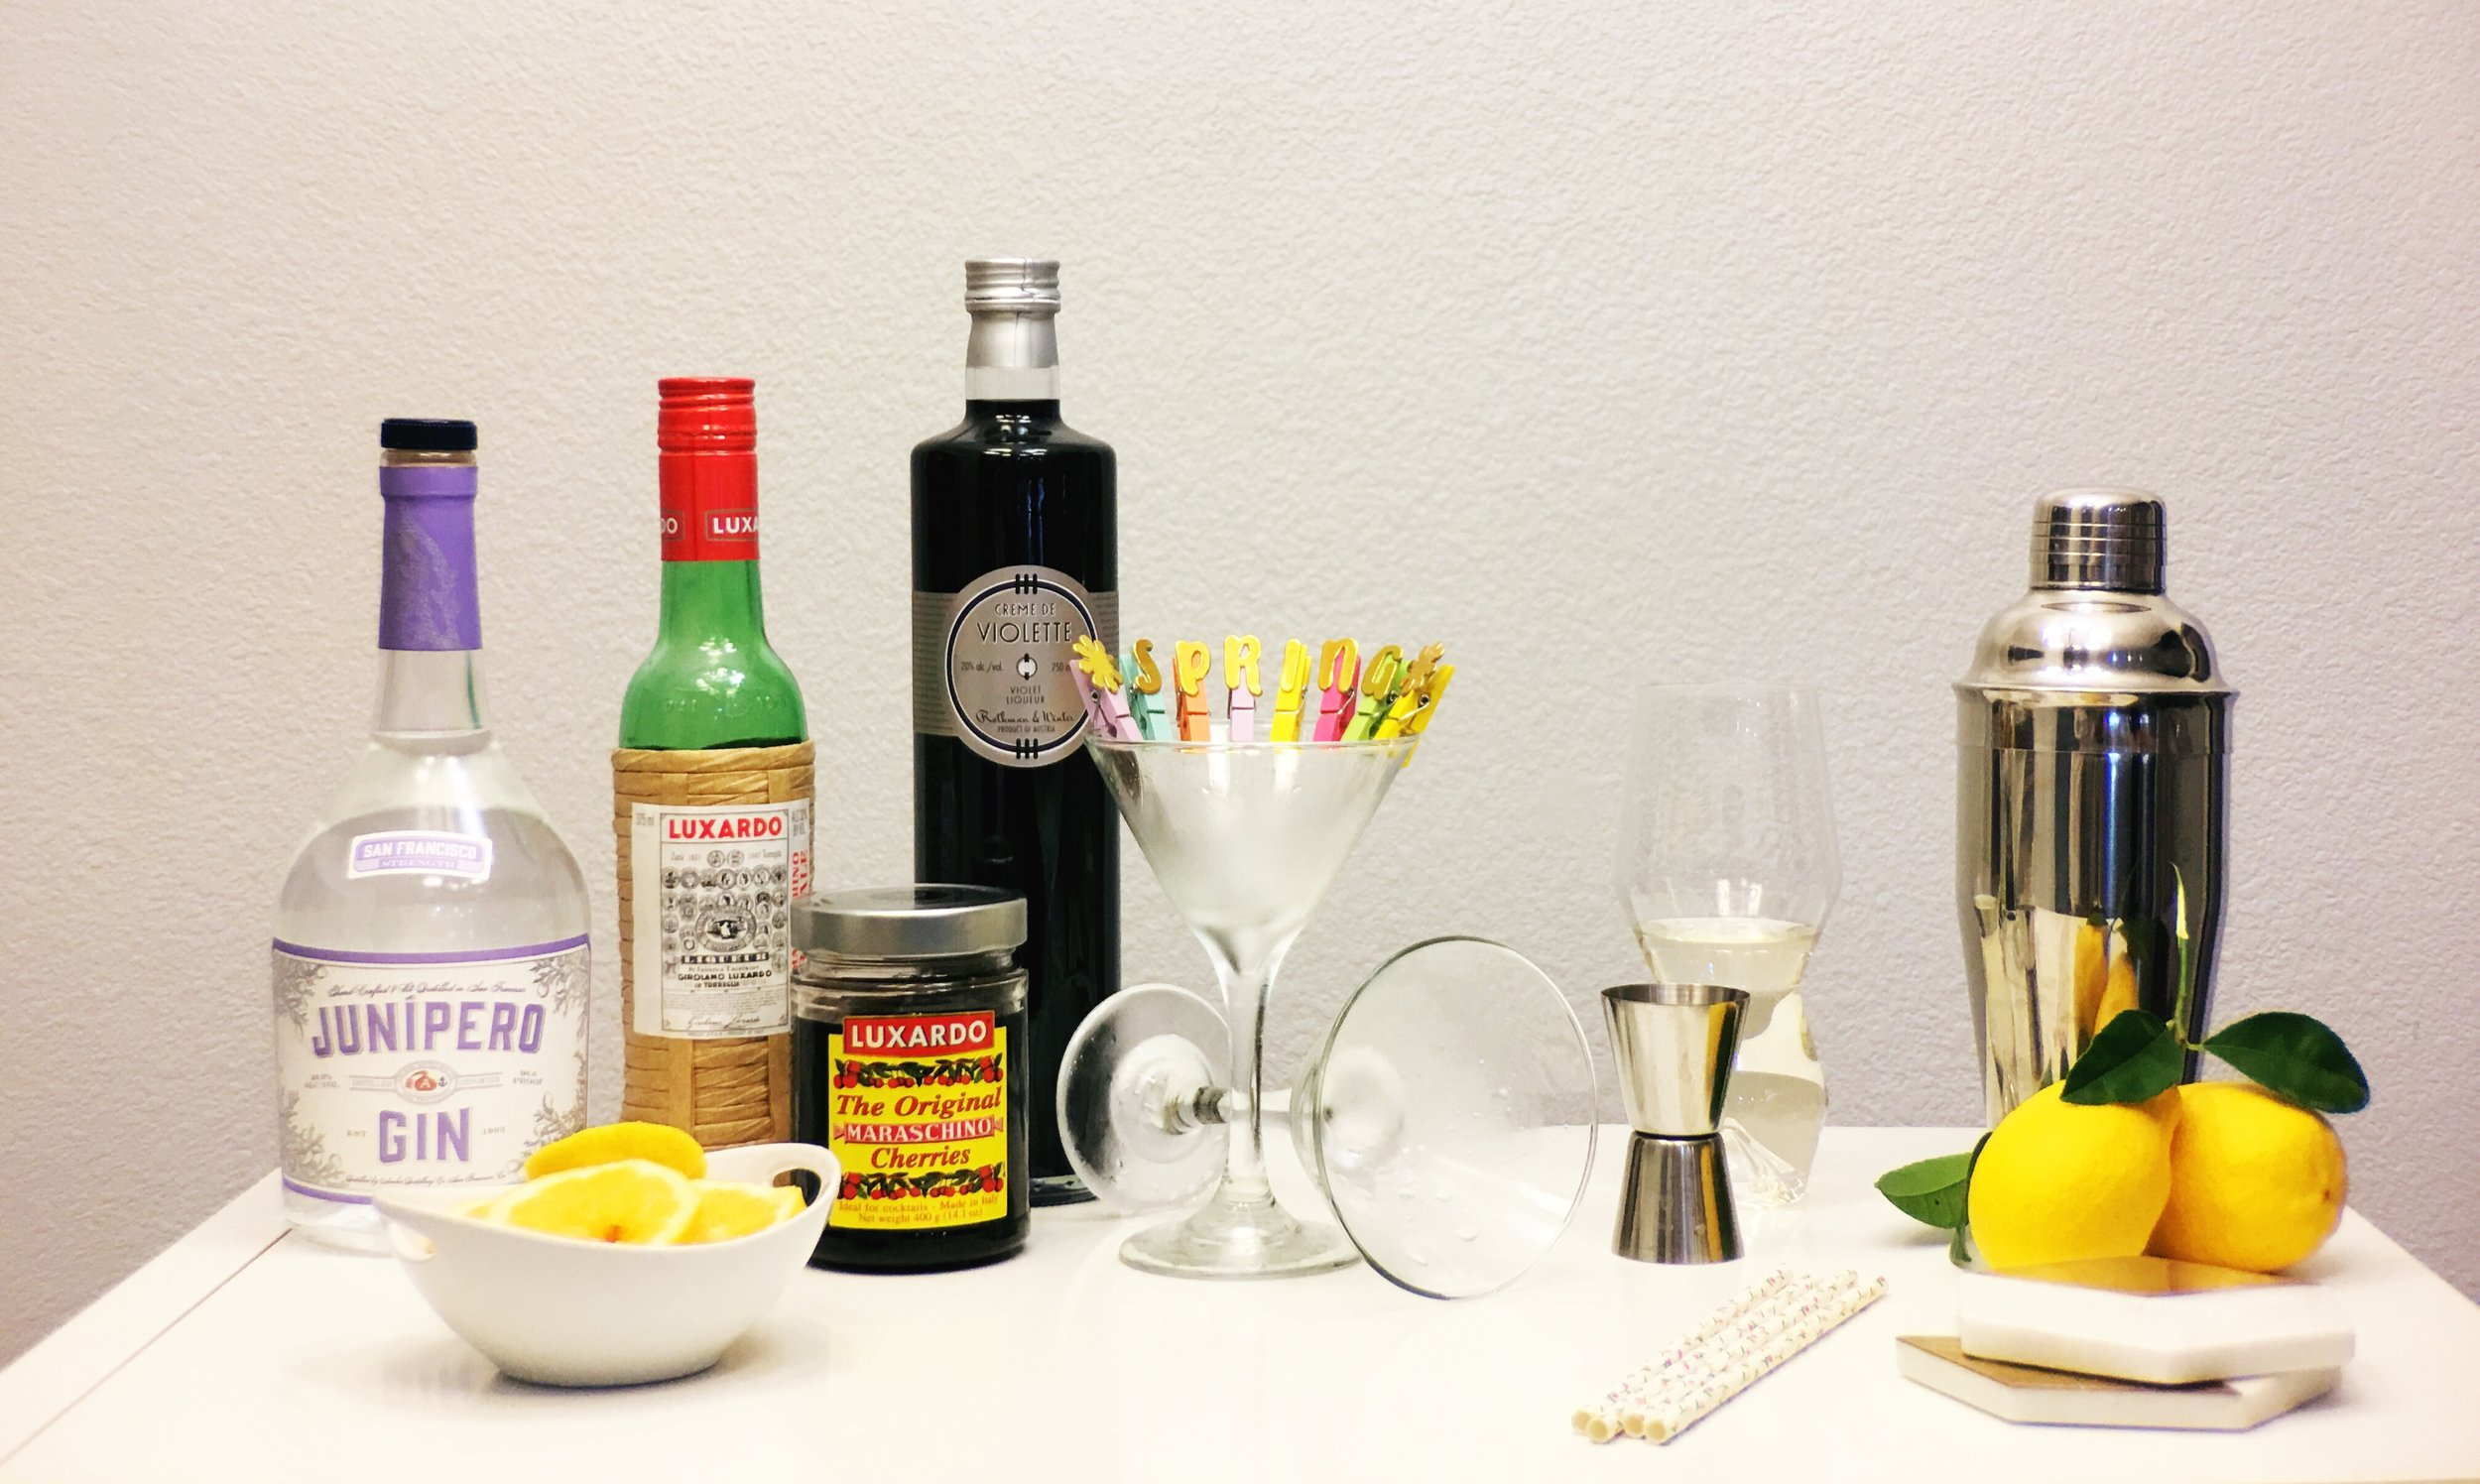 Ingredients for an Aviator Cocktail. Junipero Gin, Luxardo Marachino Liqeur, Creme De Violette and lemons